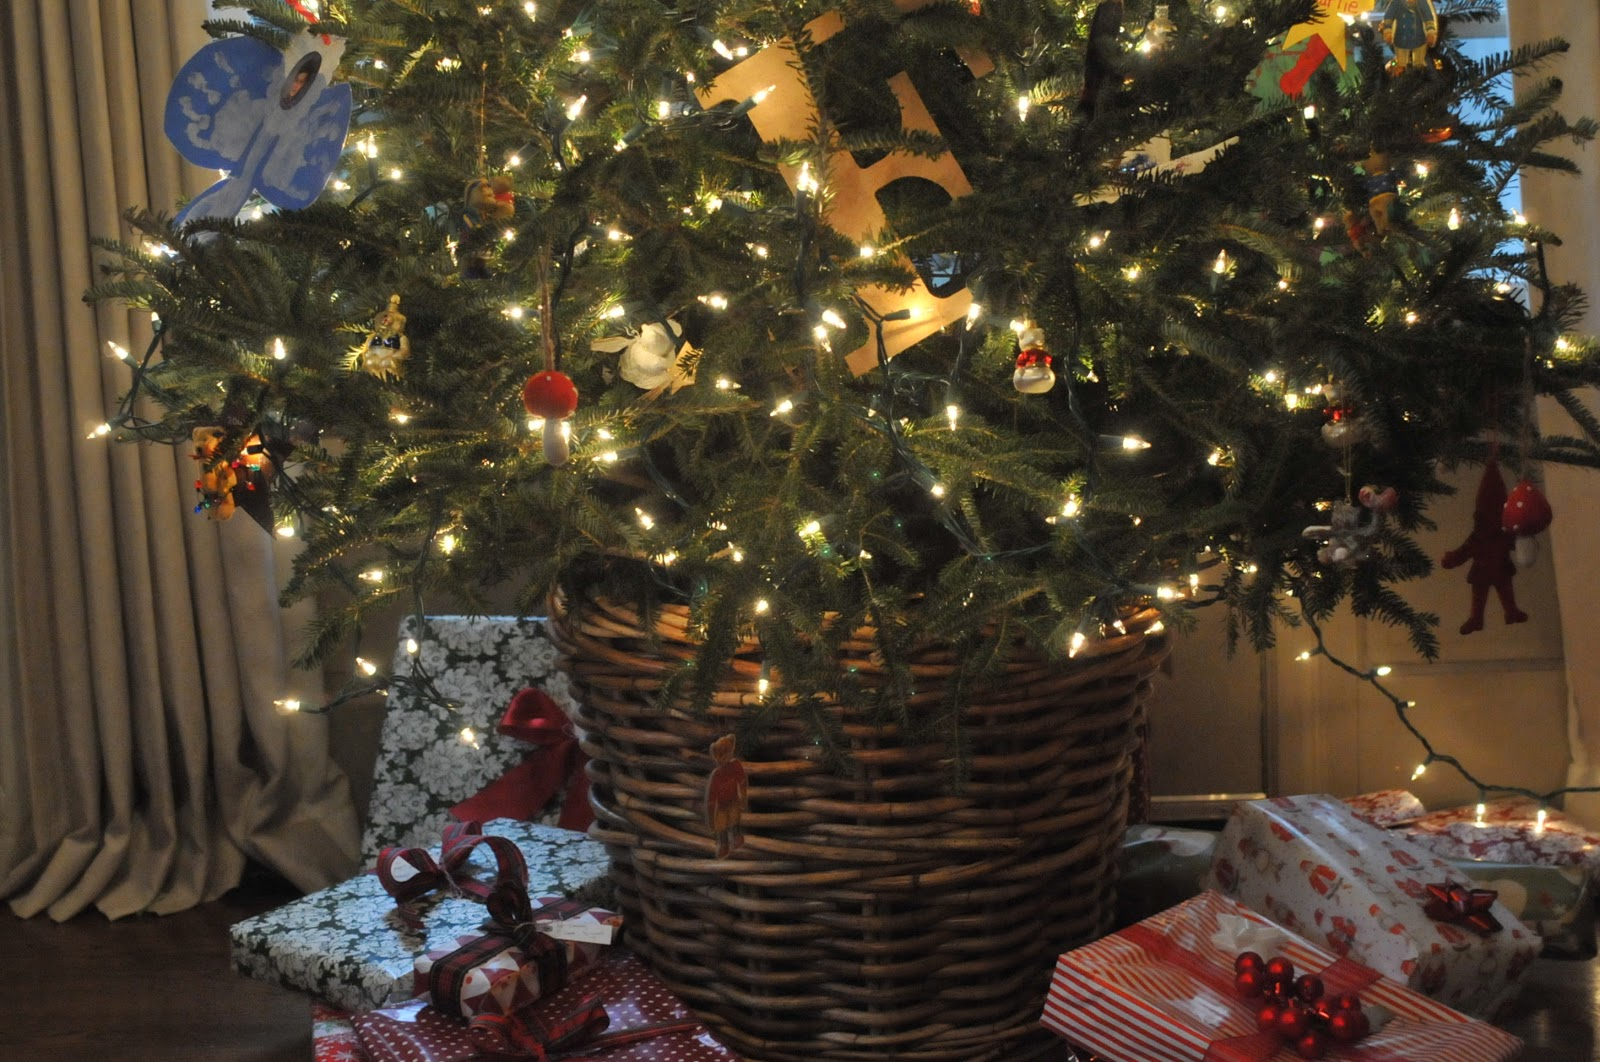 nine sixteen putting a fresh christmas tree in a basket